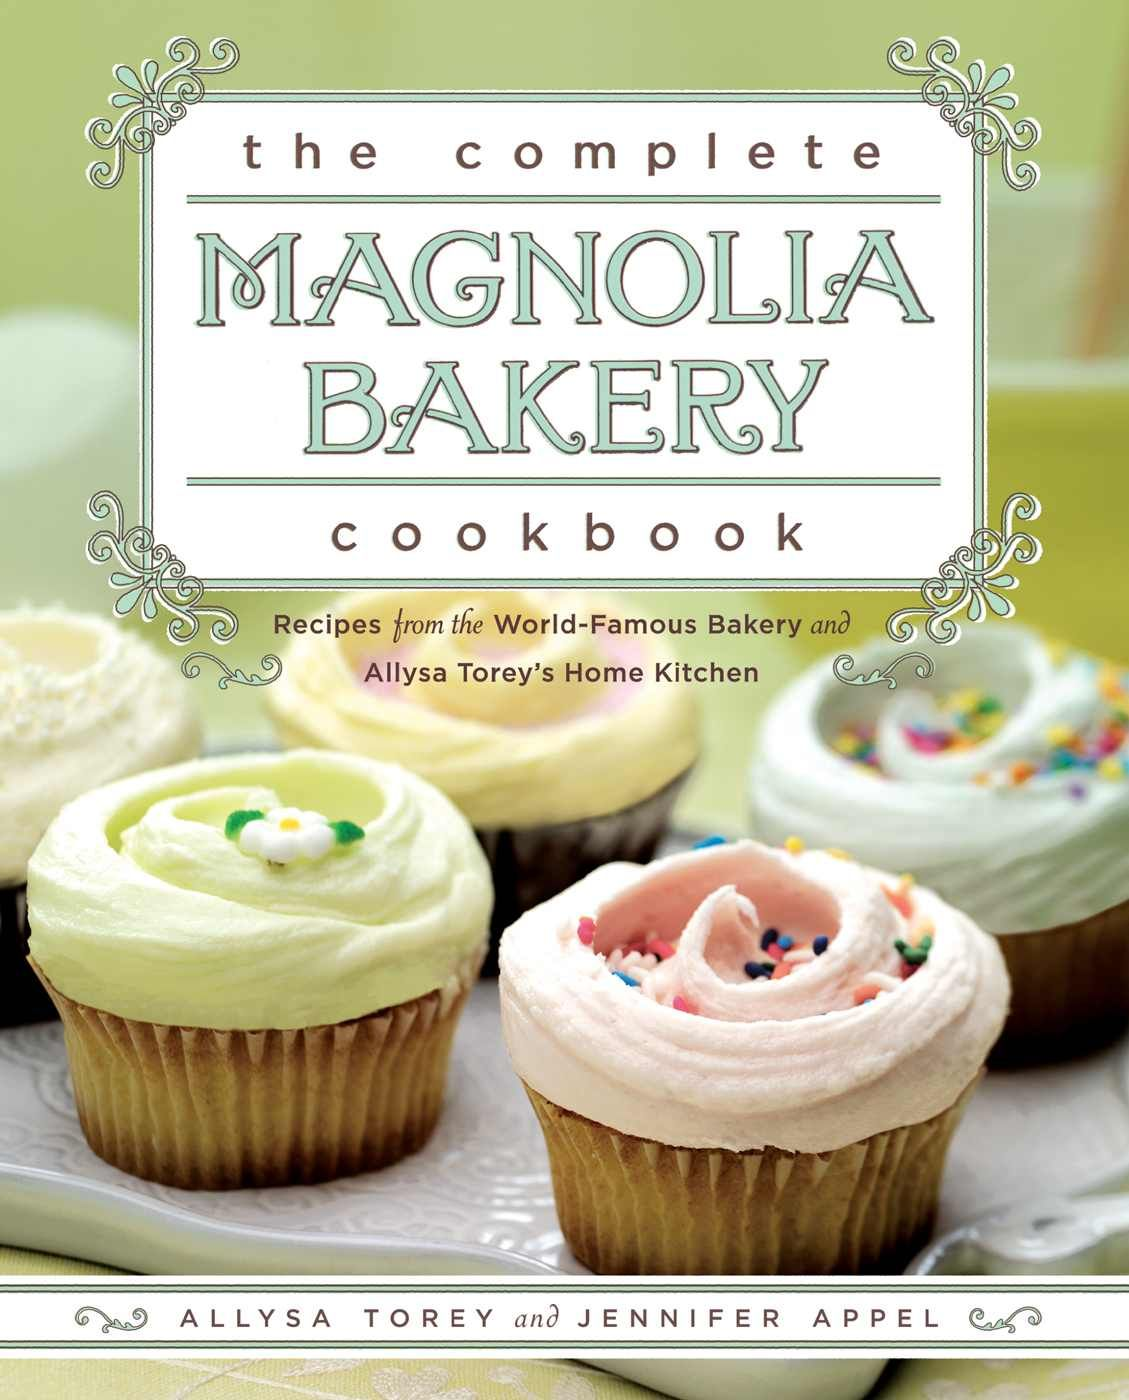 Magnolia Bakery S Caramel Pecan Cake Recipe To Eat In 2019